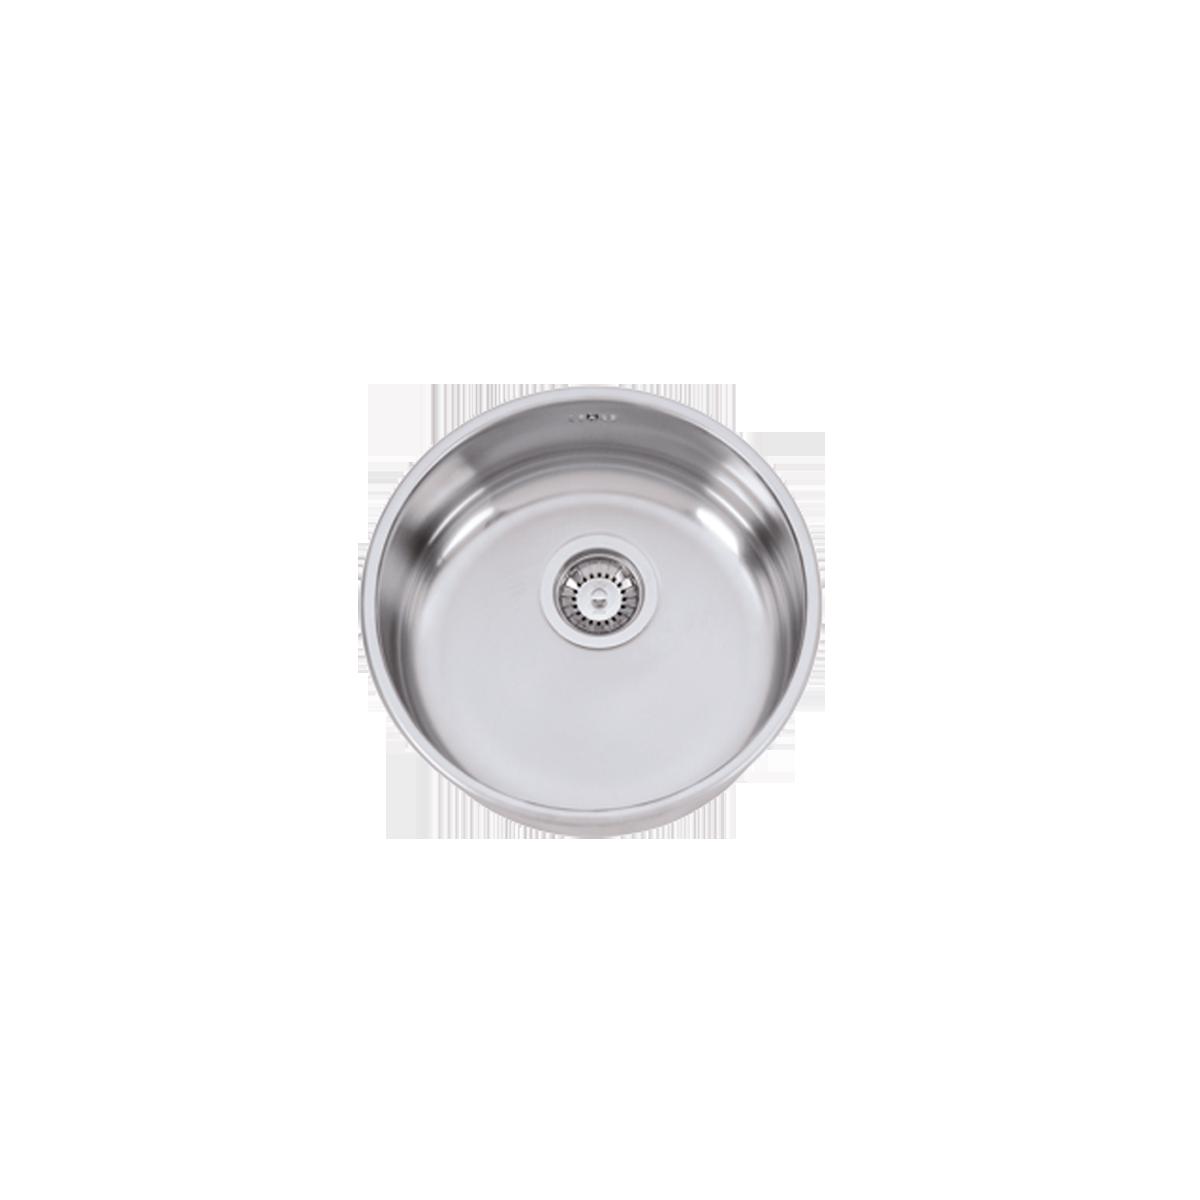 Evier en inox Rodi Single Bowls Pio Mithus finition poli couleur inox avec 1 cuve vidage manuel Pio Mithus